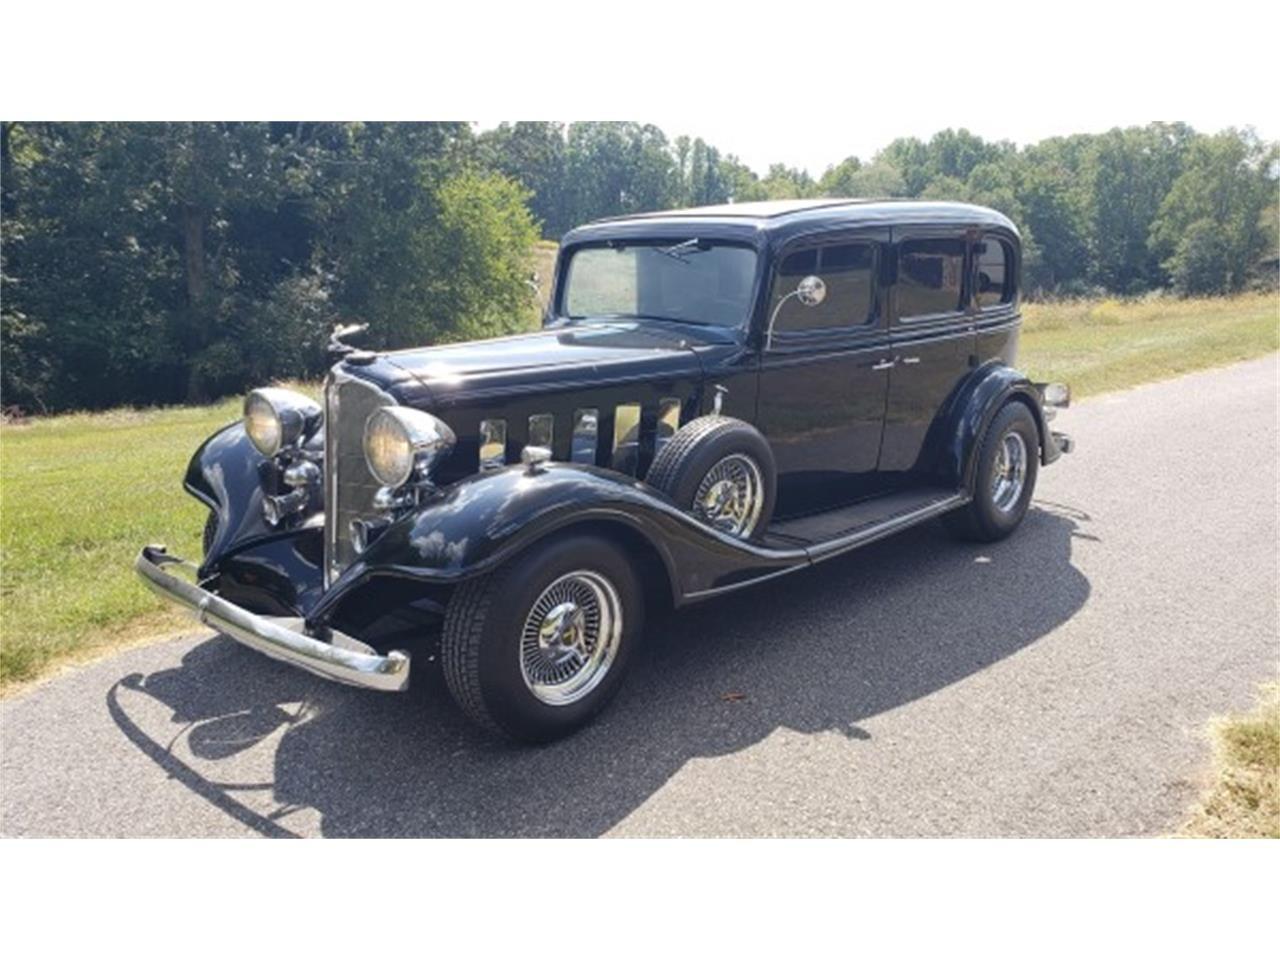 Black 1933 Buick 4Dr Sedan for sale located in Suwanee